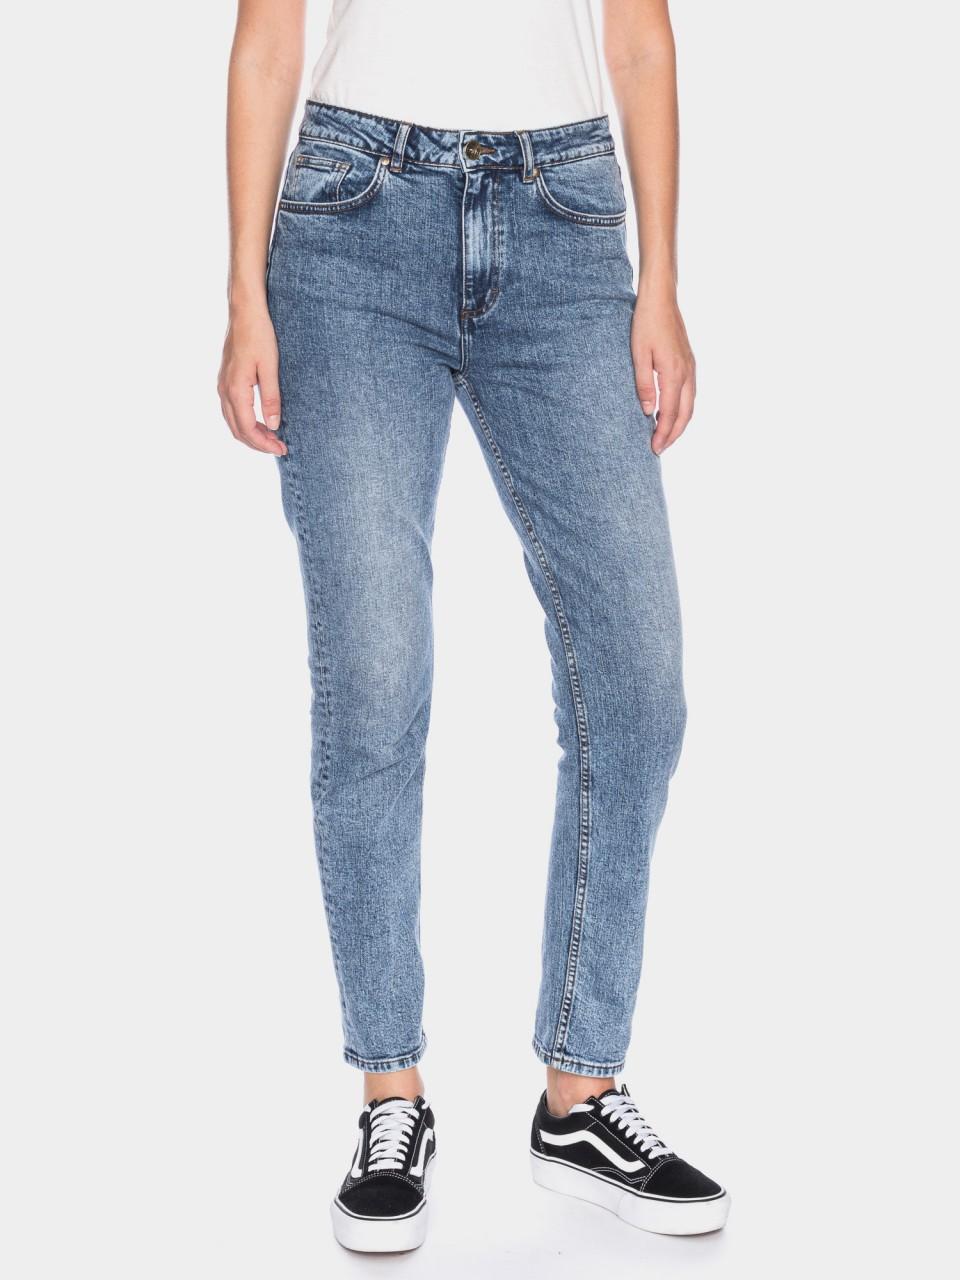 Jeans Khloe GOTS RR2716 HBL USD